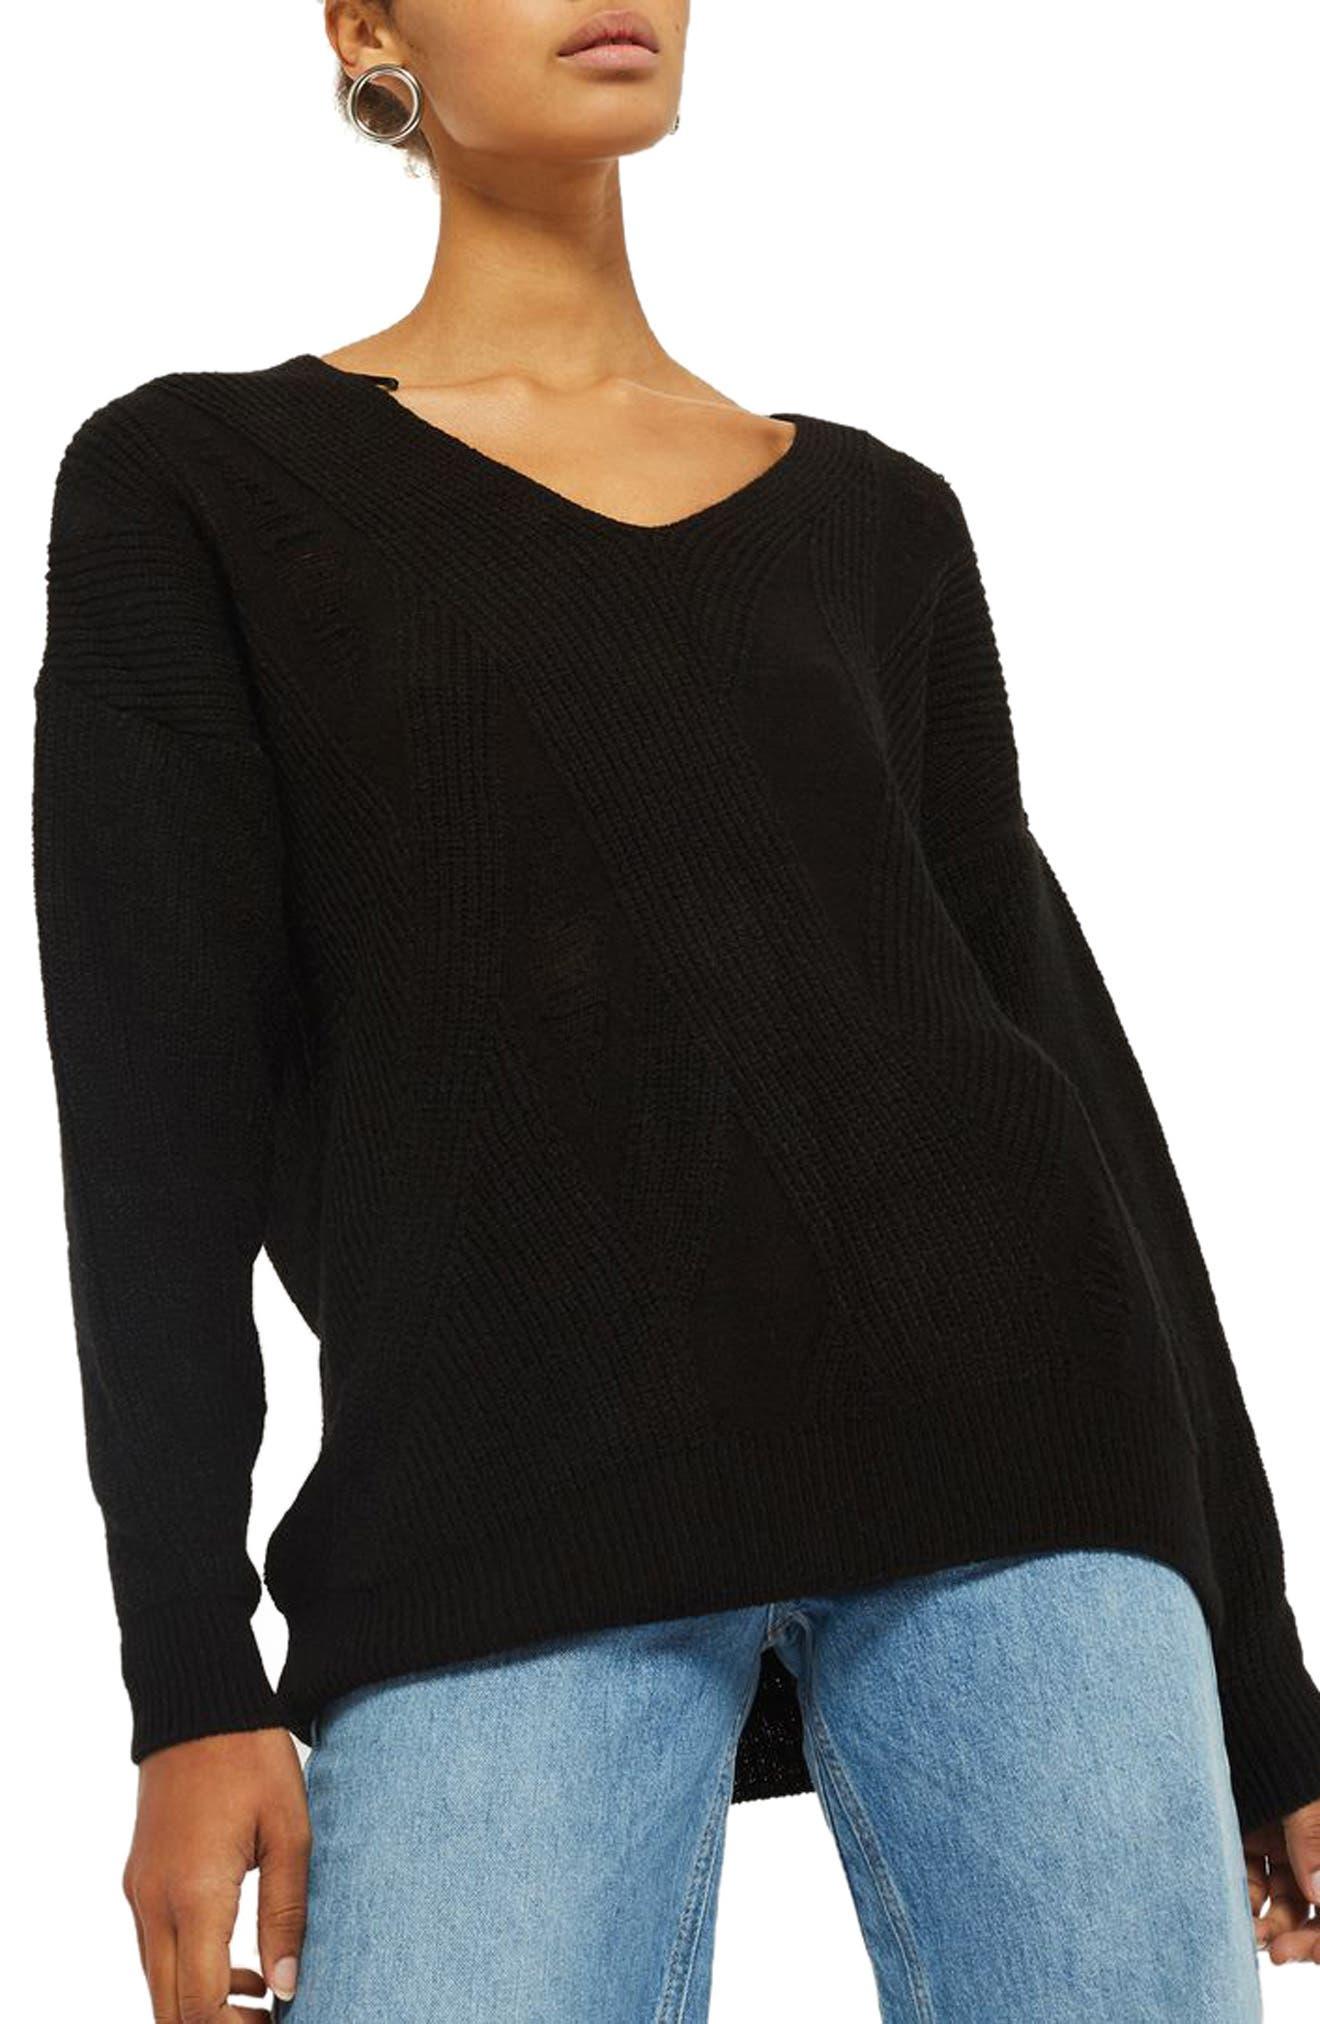 Ladder Stitch Sweater,                         Main,                         color, Black